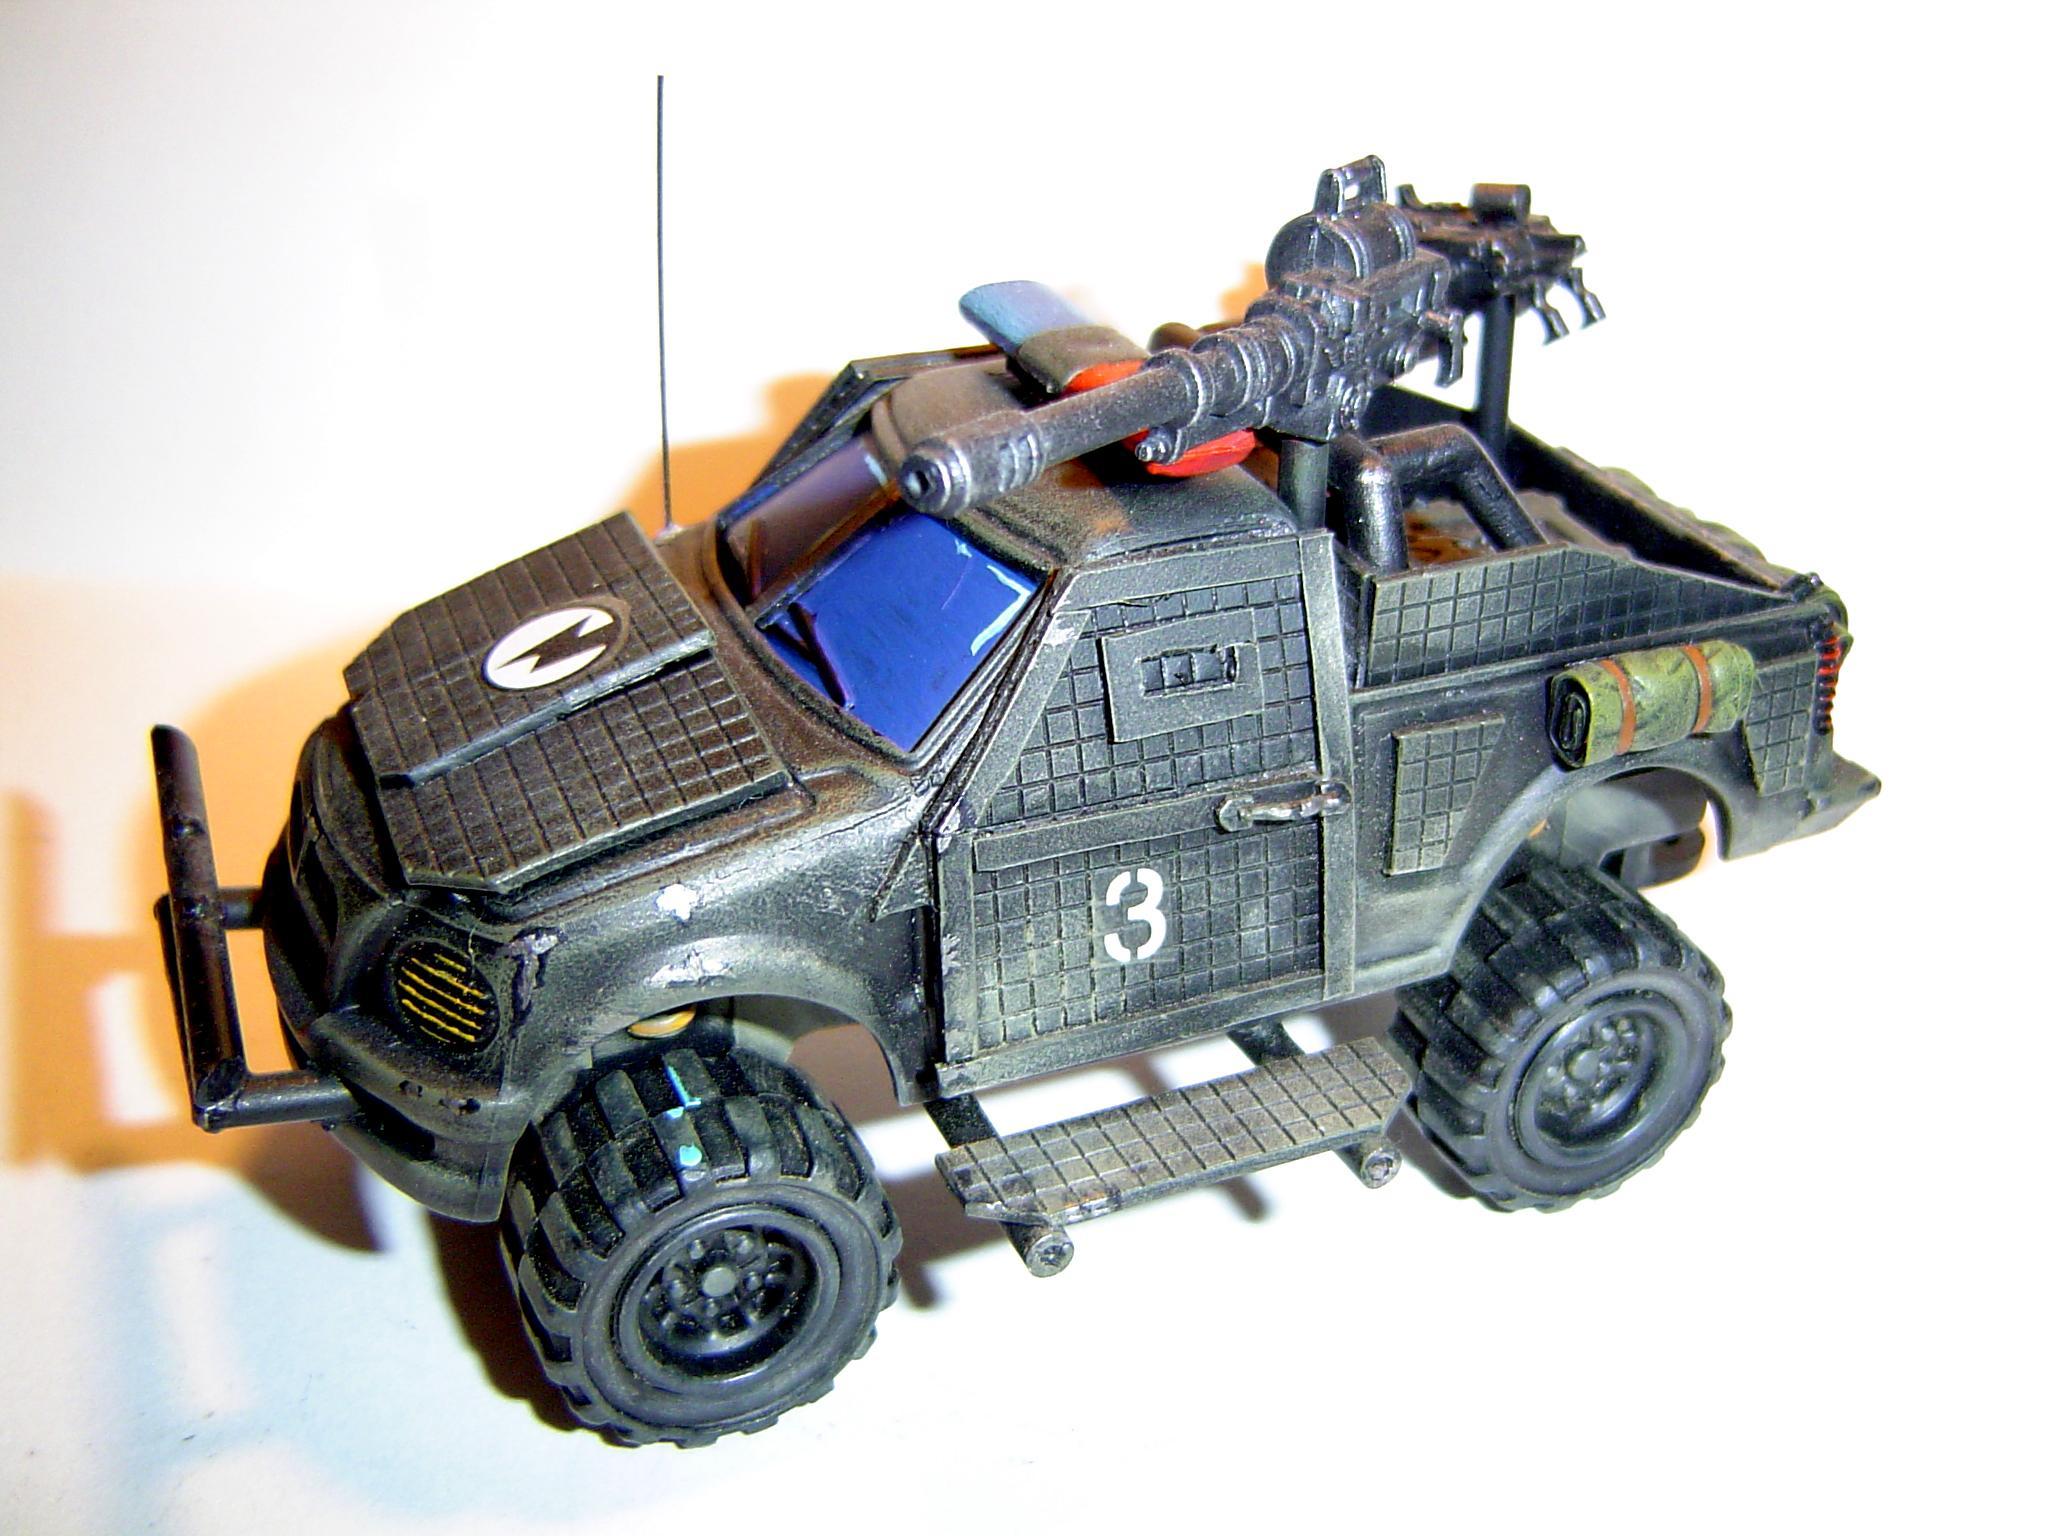 4x4, Imperial Guard, Salimander, Steel Legion, Tank, Warhammer 40,000